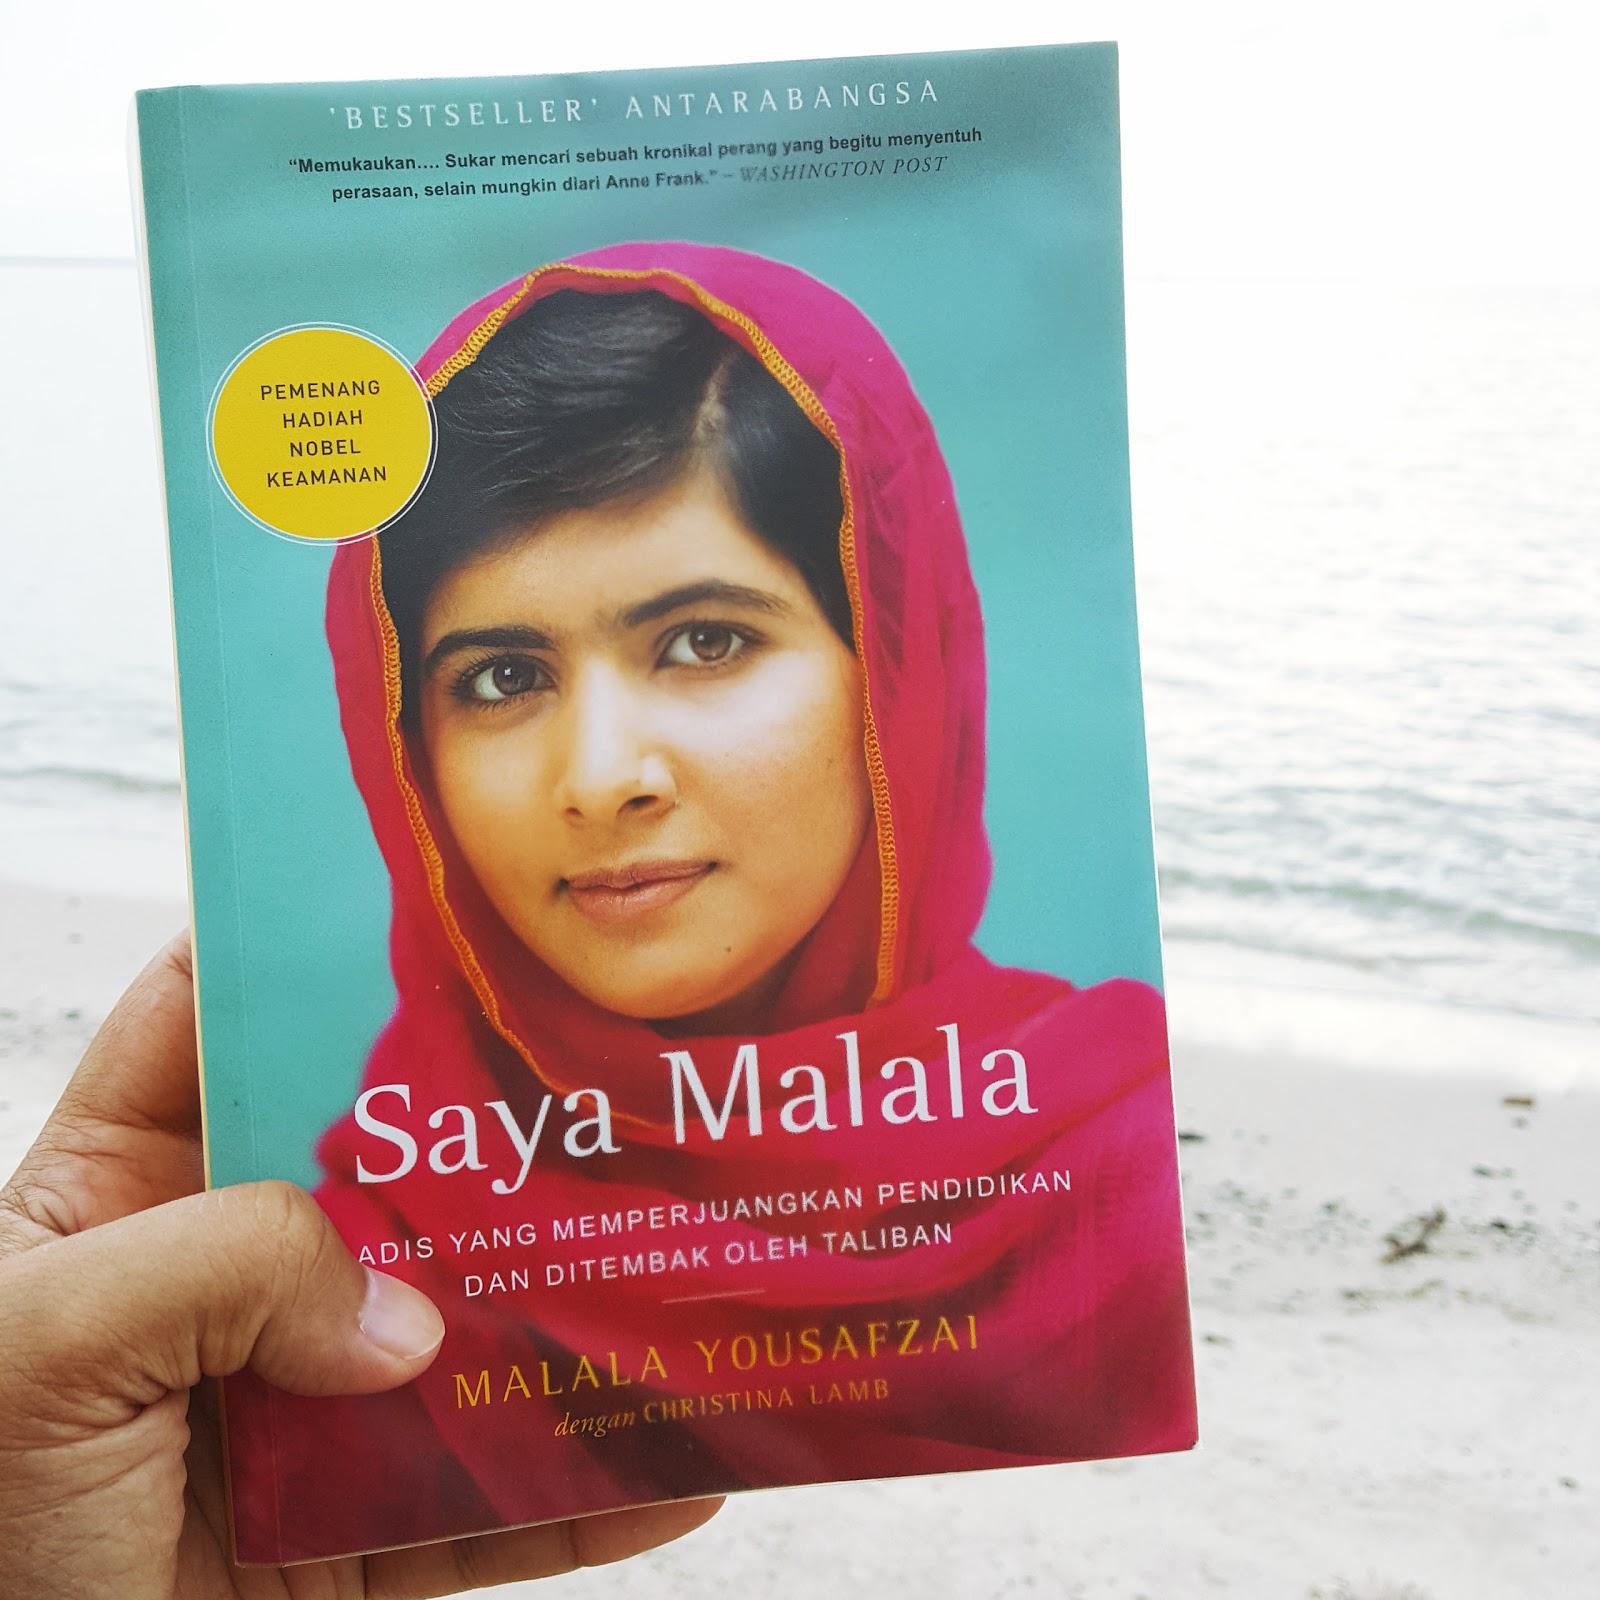 Saya Malala